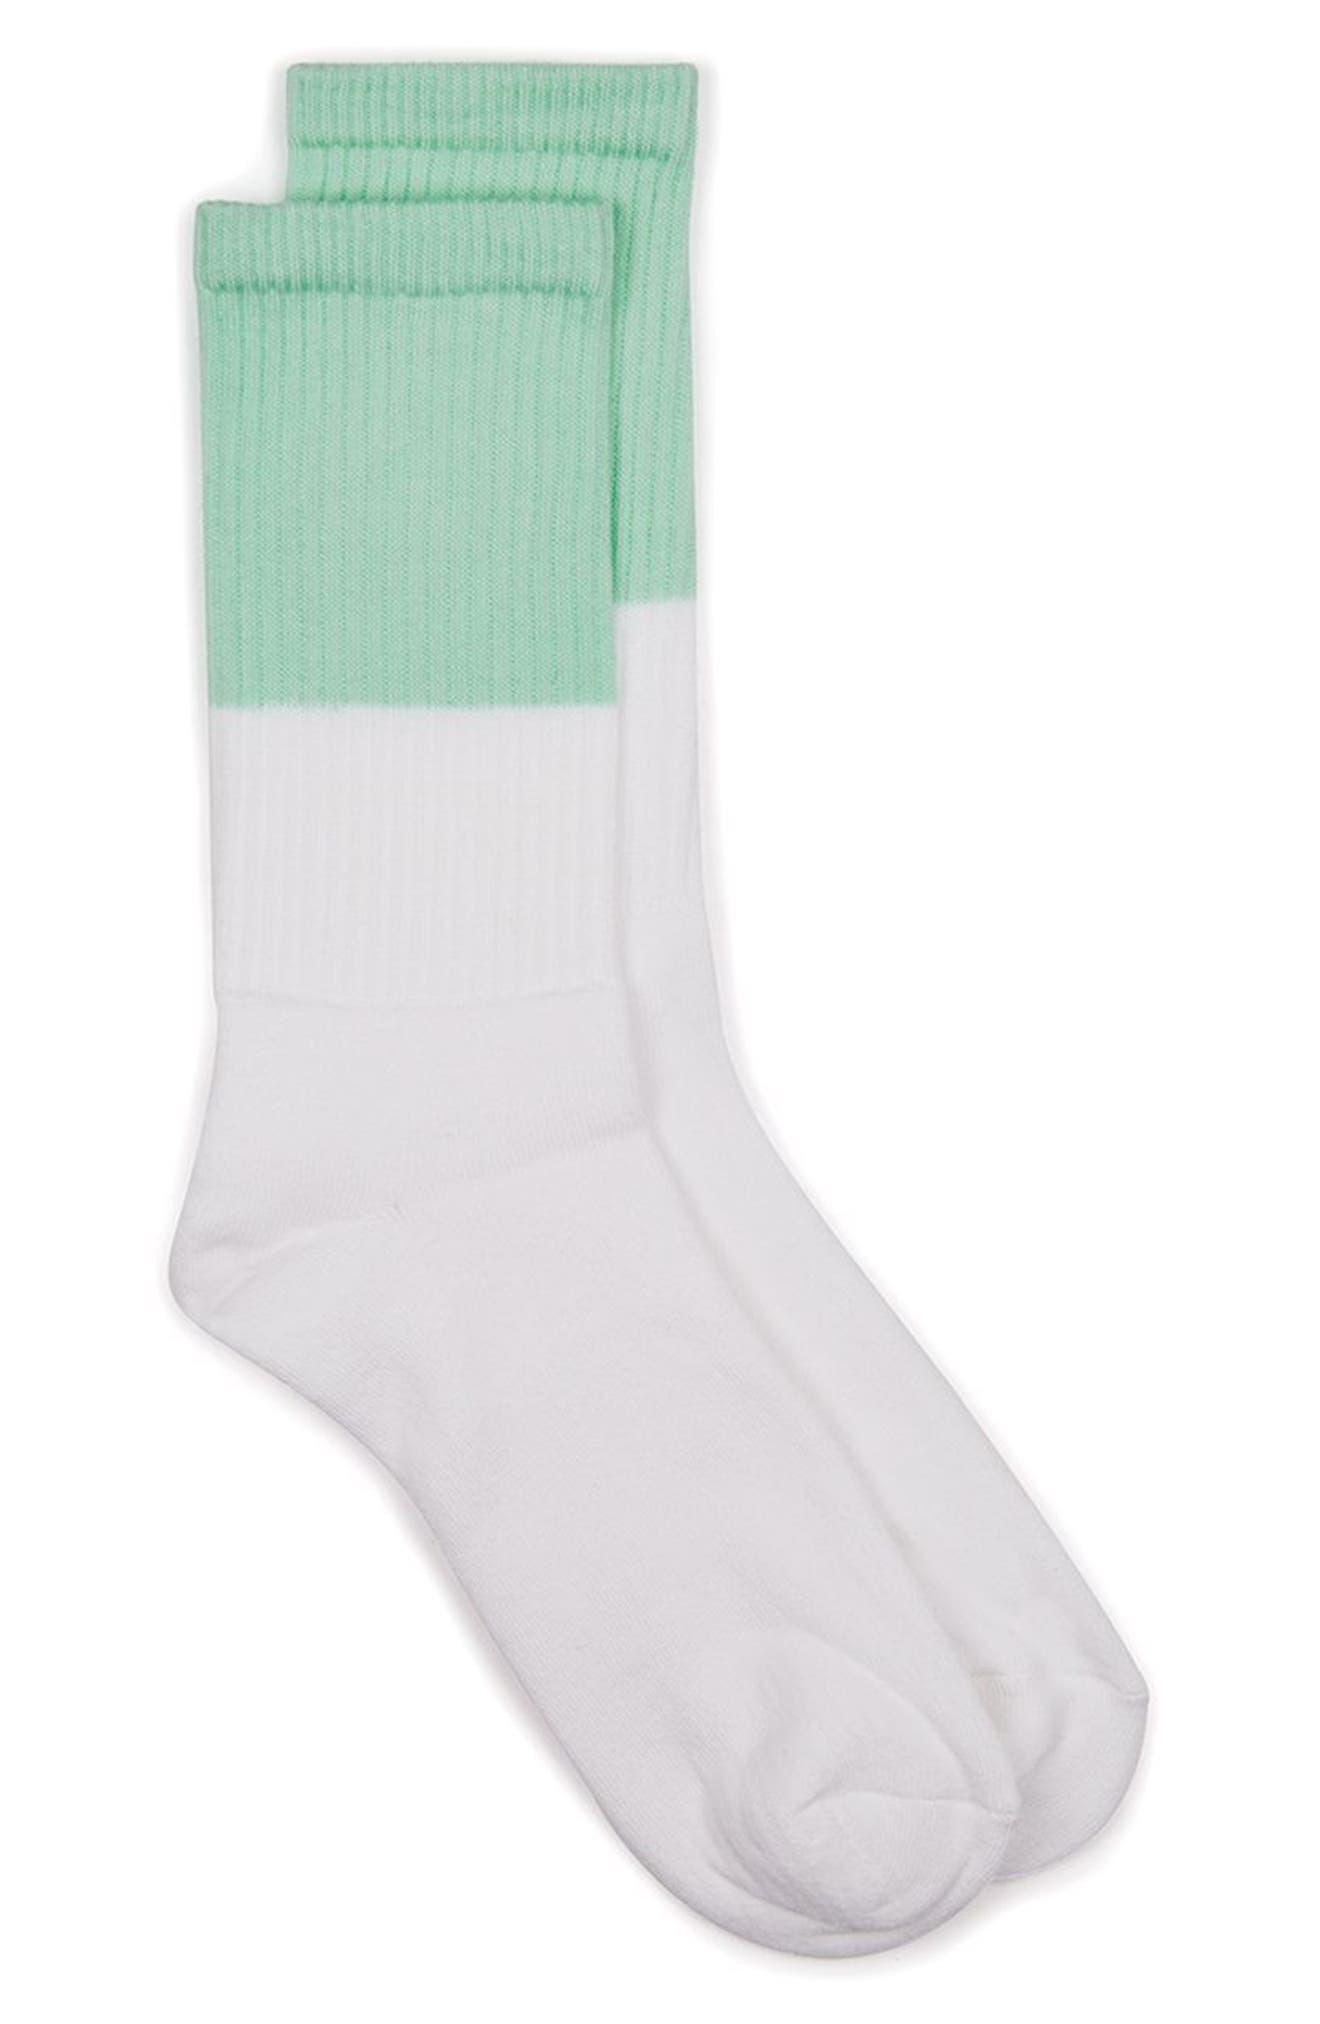 Colorblock Tube Socks,                             Main thumbnail 1, color,                             300